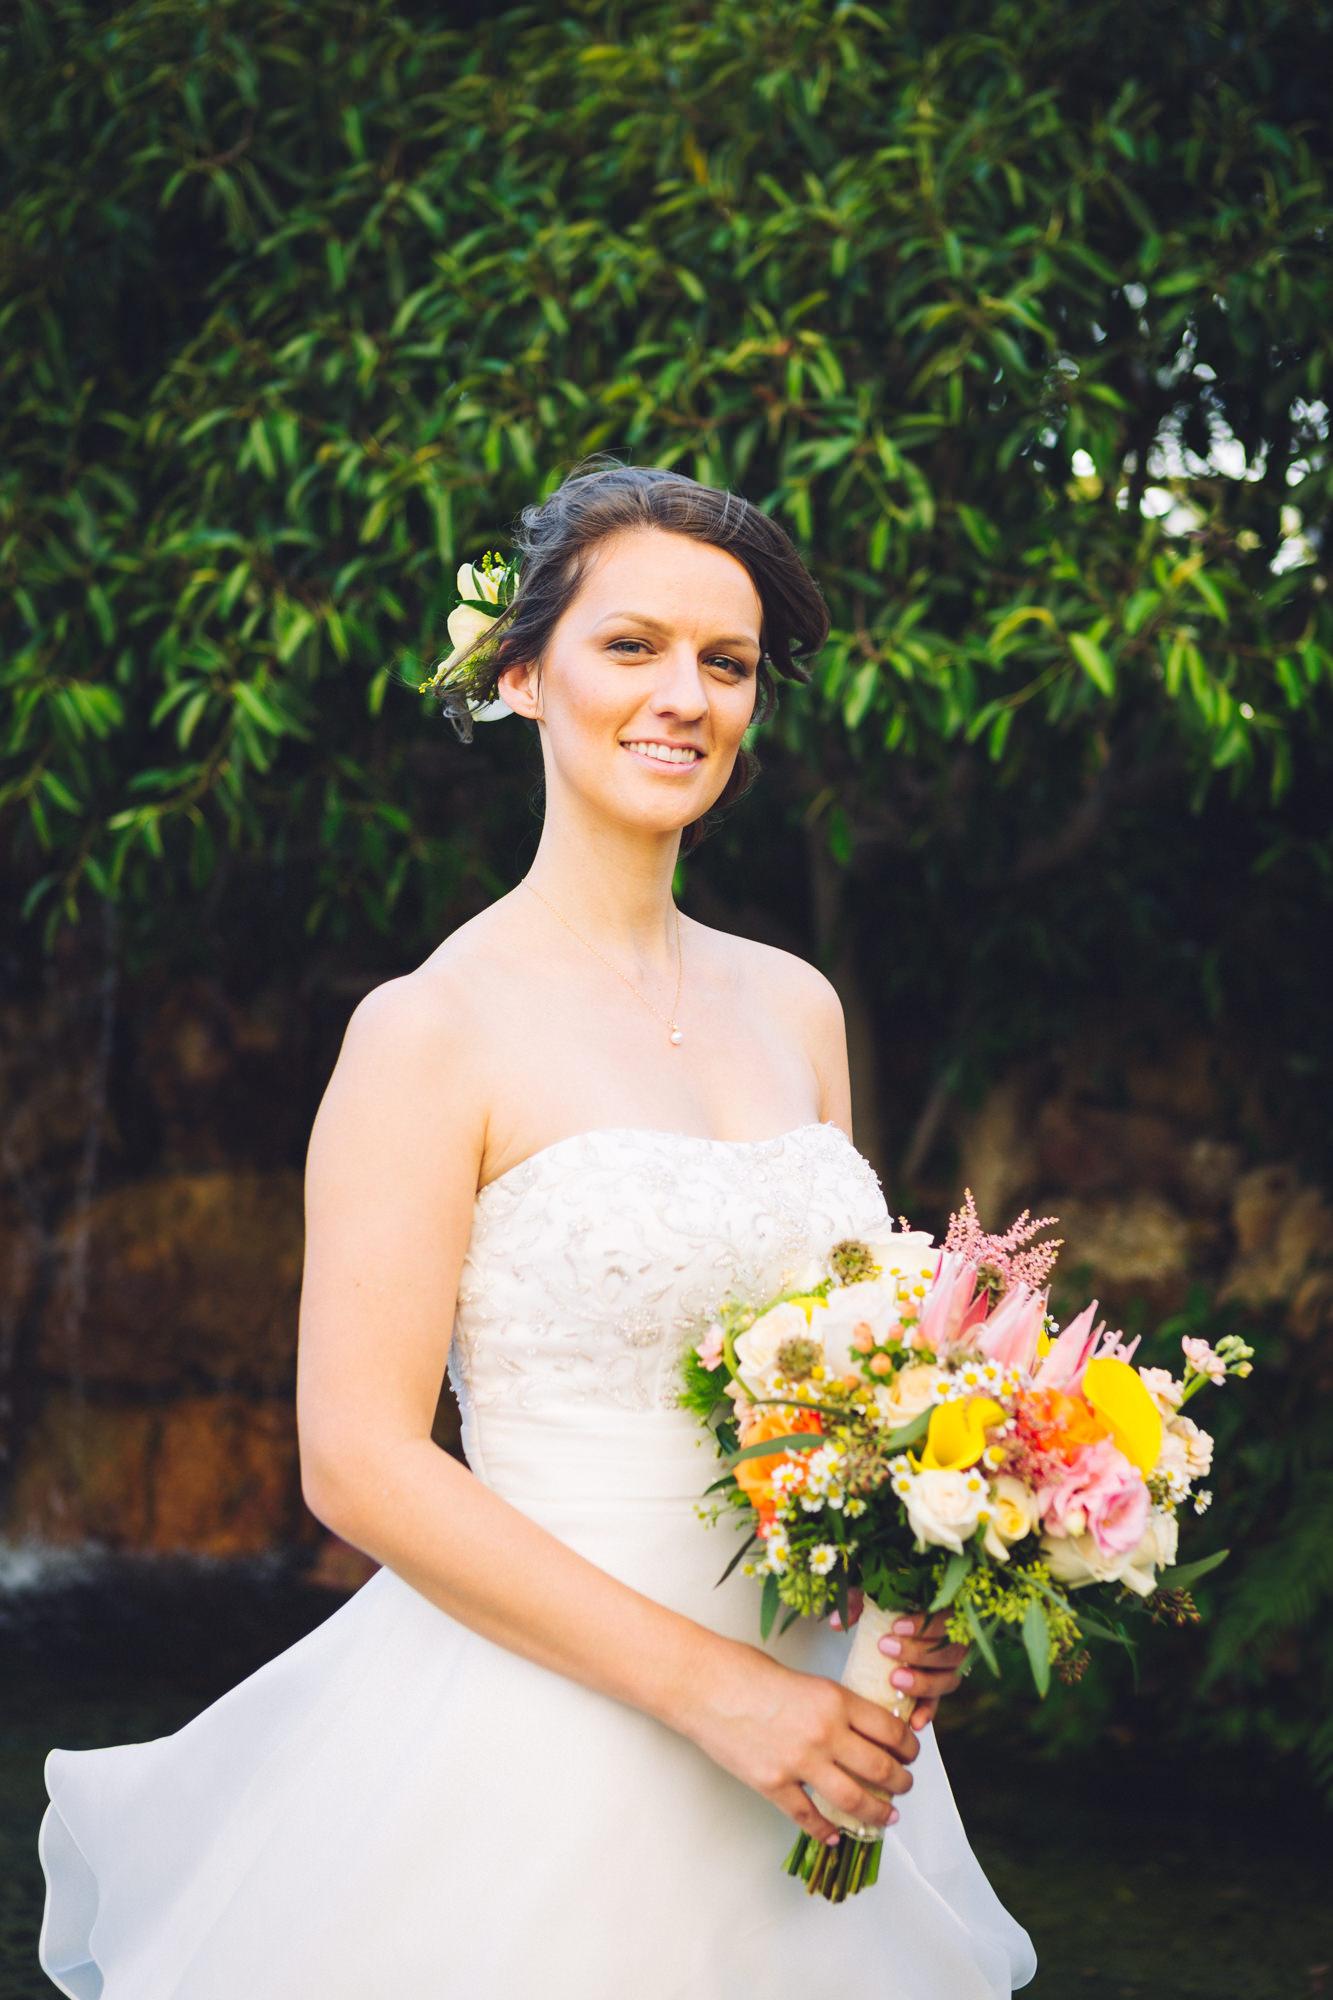 thelightandglass-wedding-engagement-photography-087.jpg